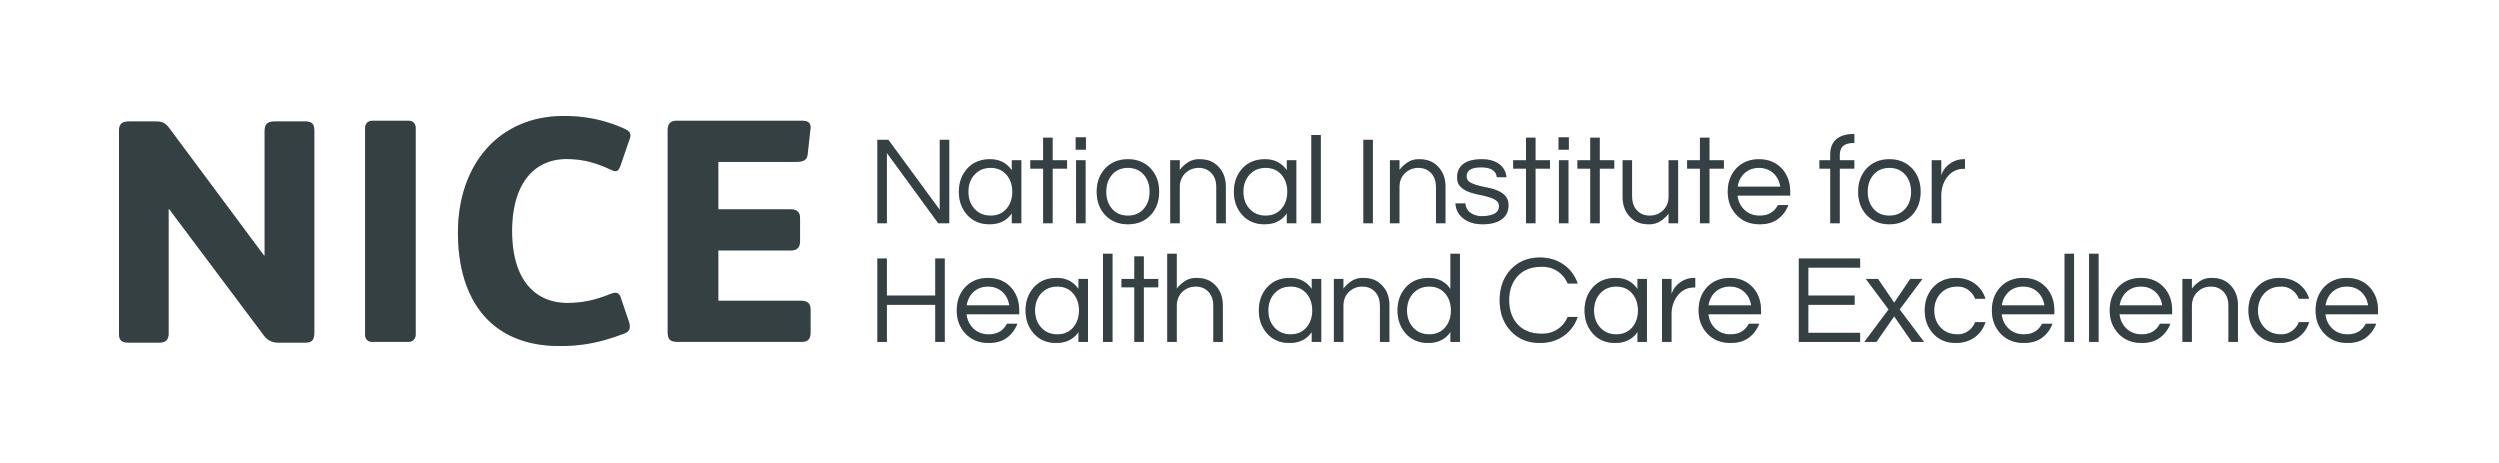 NICE Logo_2015 07 30